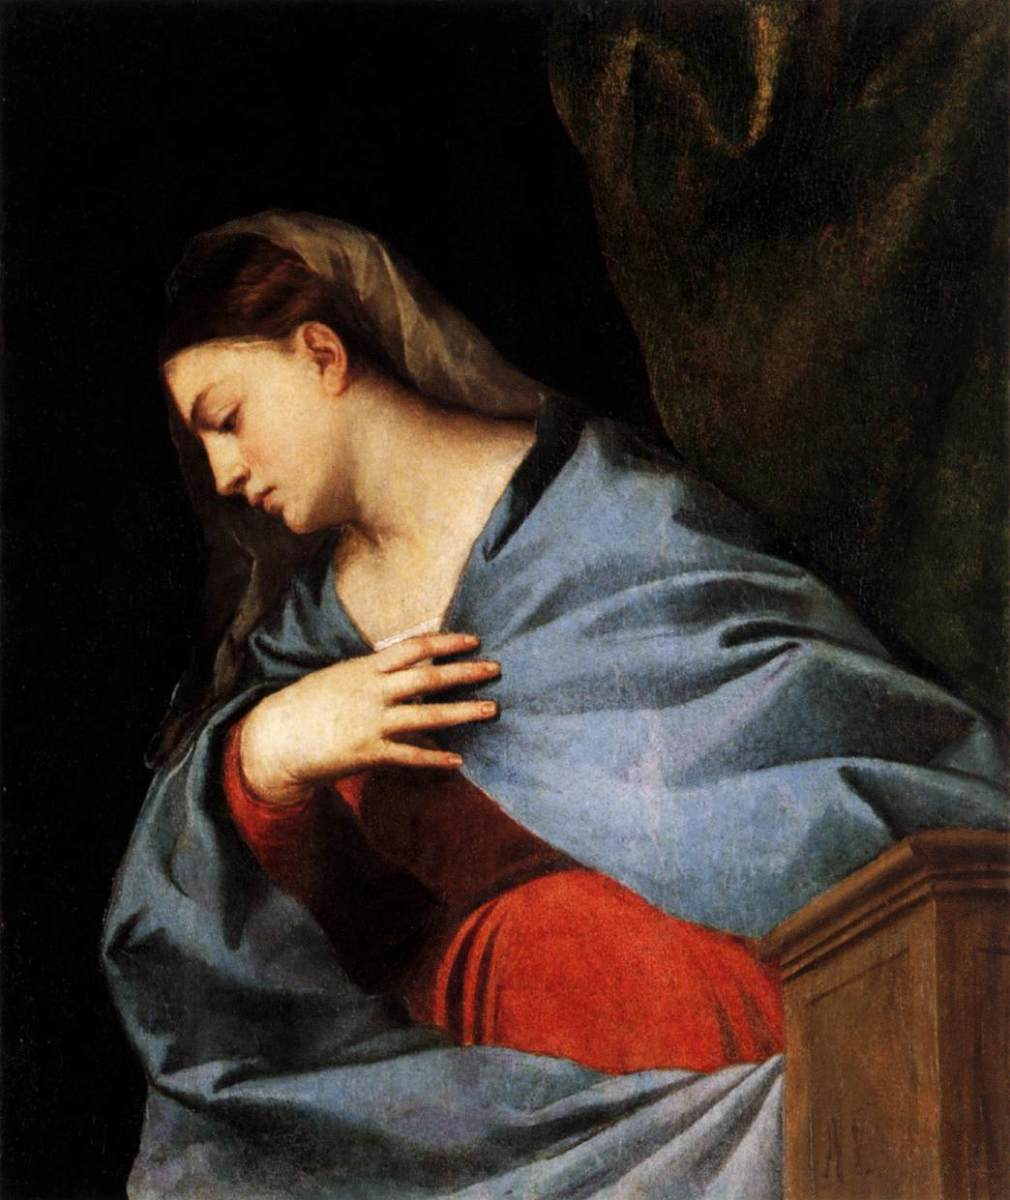 Virgin Mary, Titian